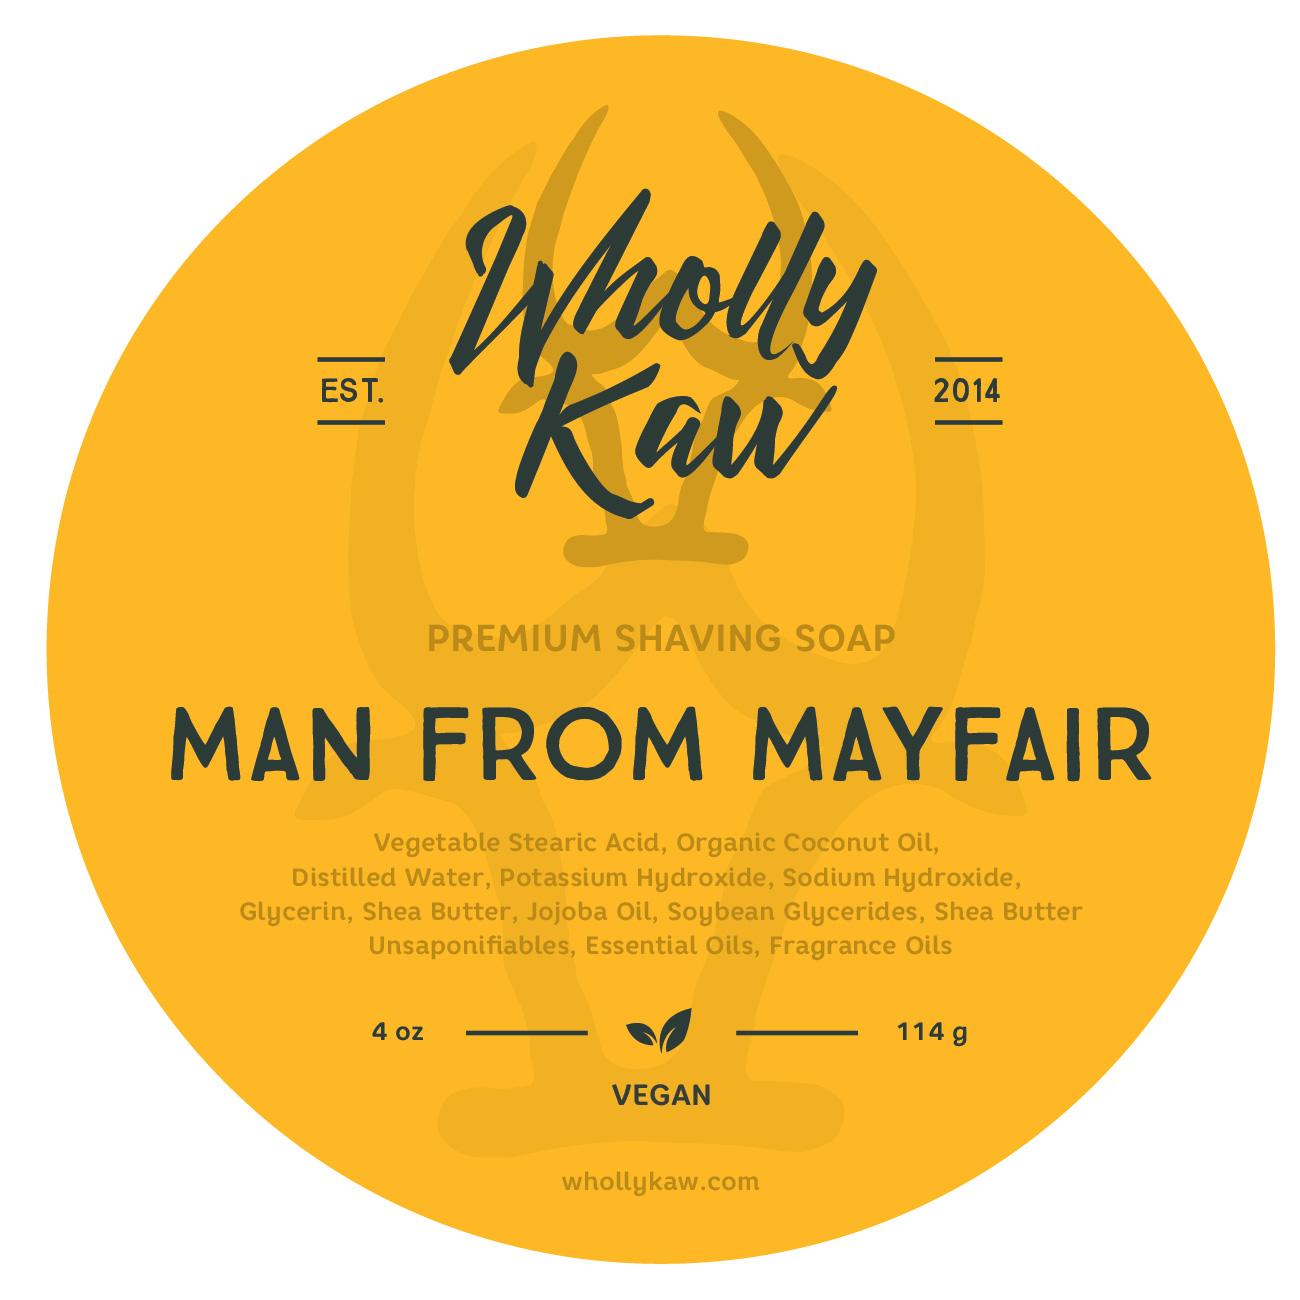 Wholly Kaw - Man From Mayfair - Soap (Vegan) image